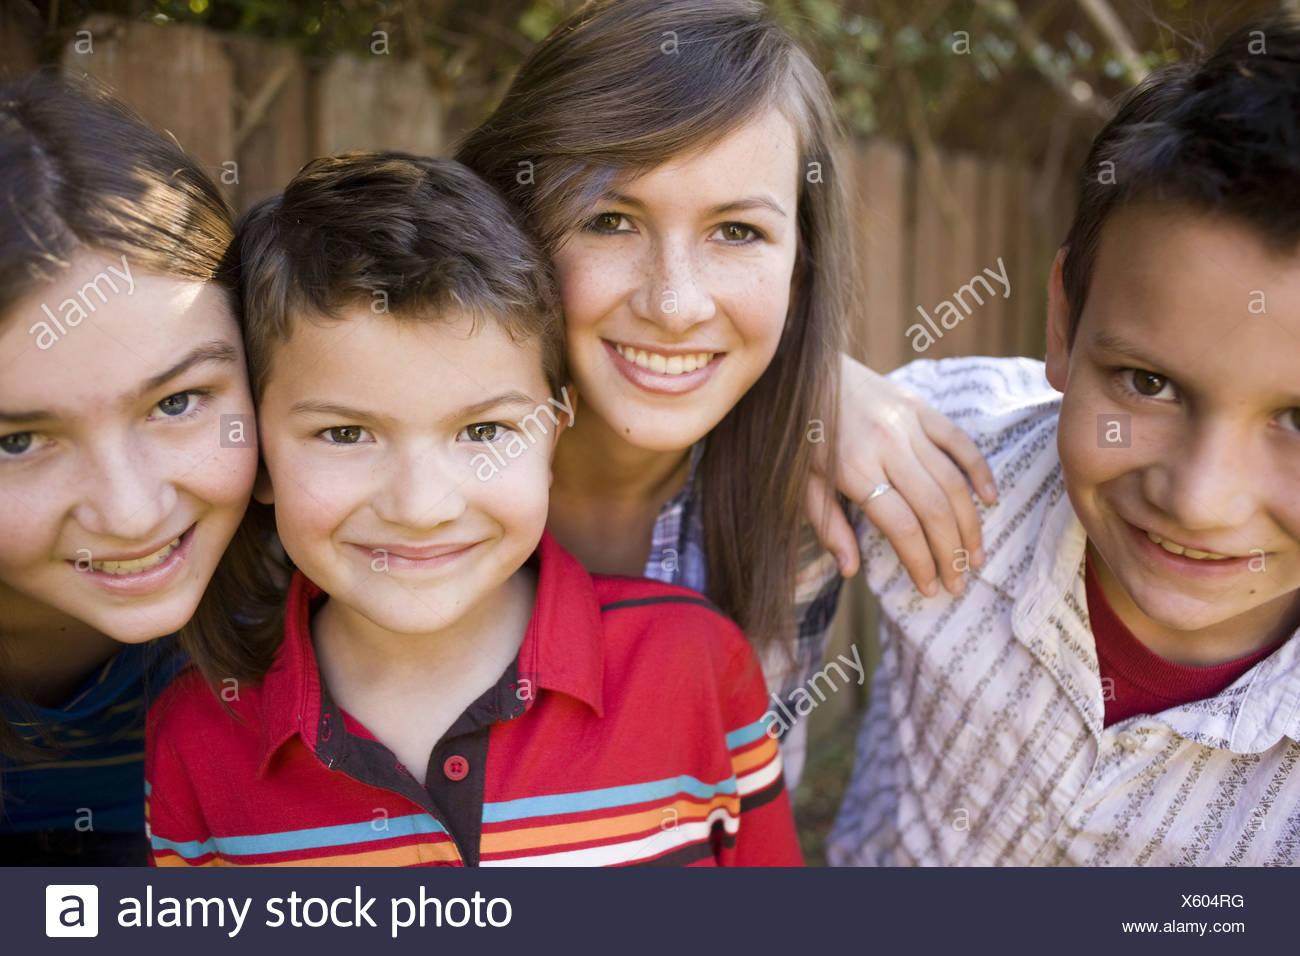 Bambini sorridenti in posa all'aperto Immagini Stock